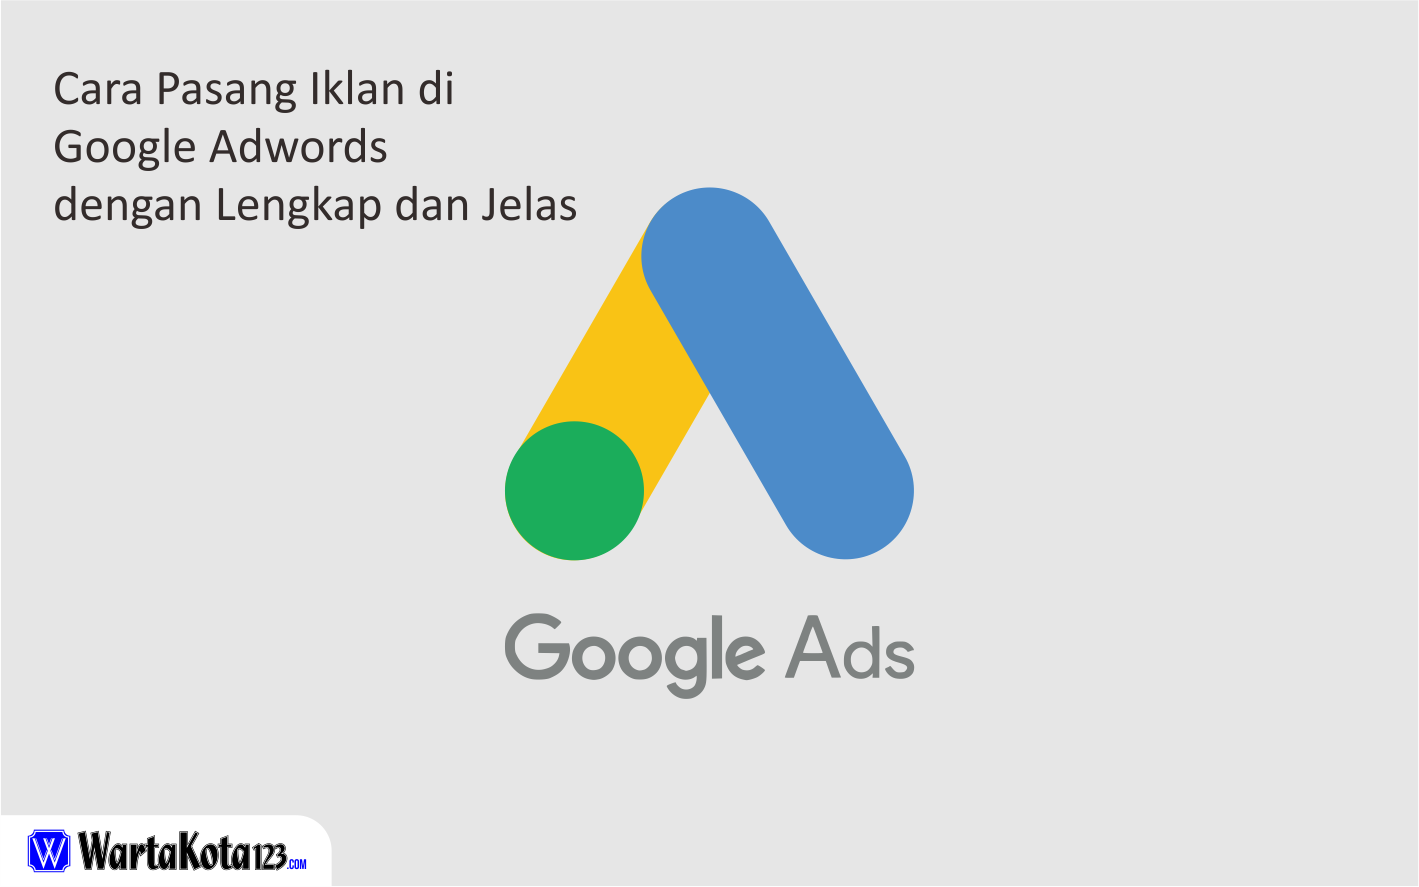 Cara Pasang Iklan Google Adwords Lengkap Dan Jelas Wartakota123